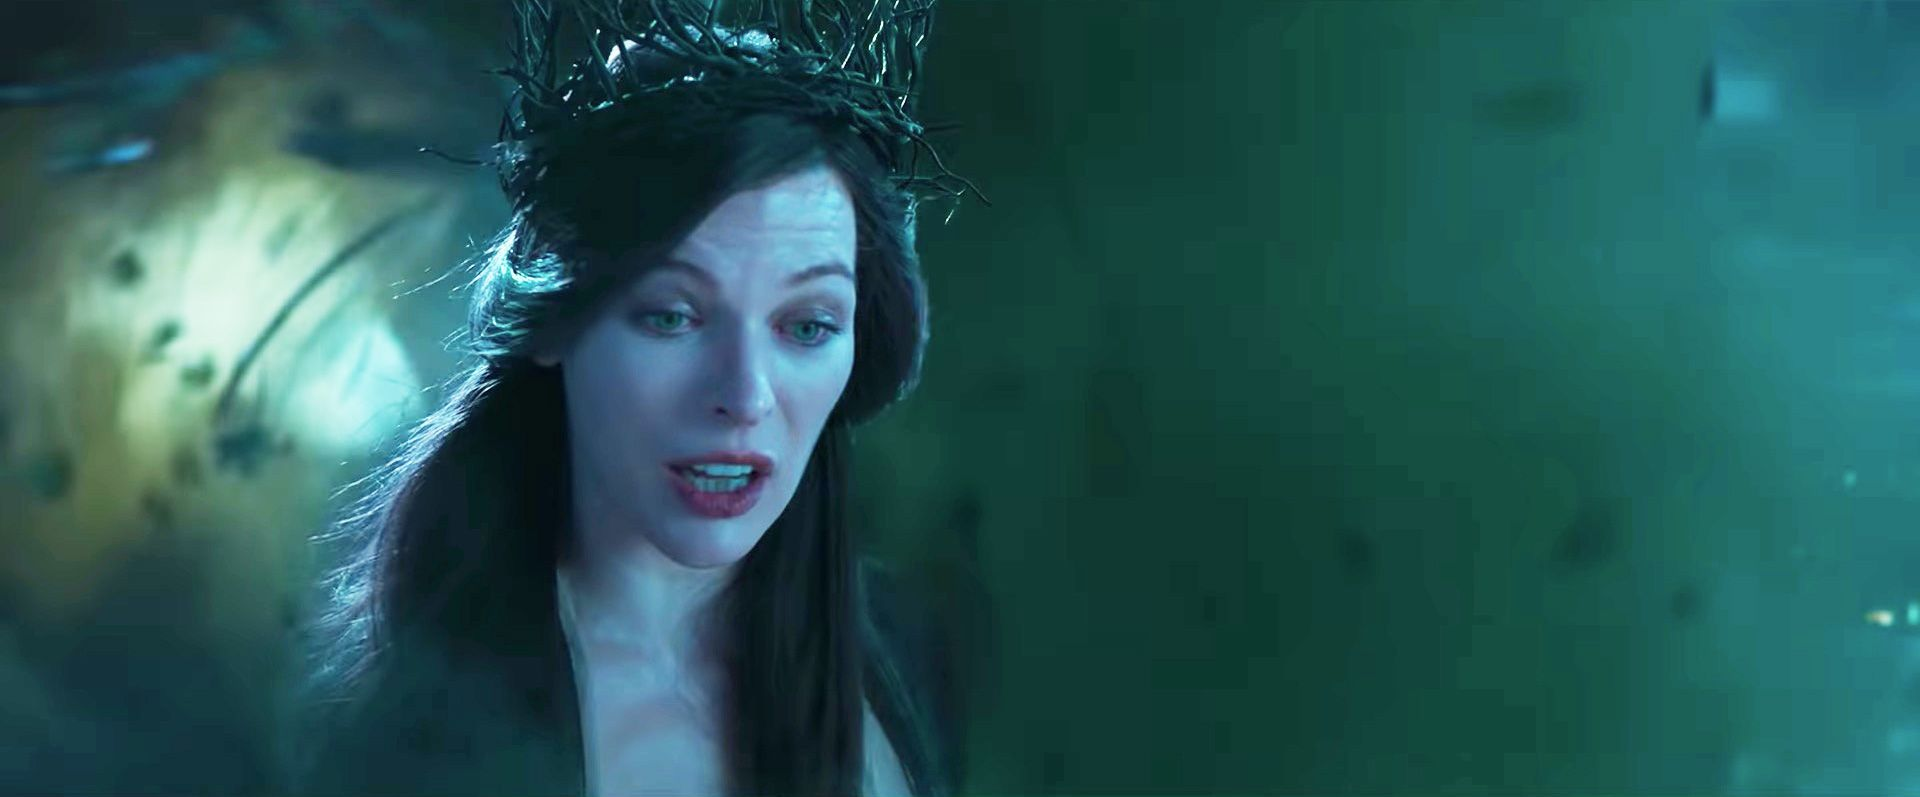 Milla Jovovich nudes (58 fotos) Selfie, YouTube, butt